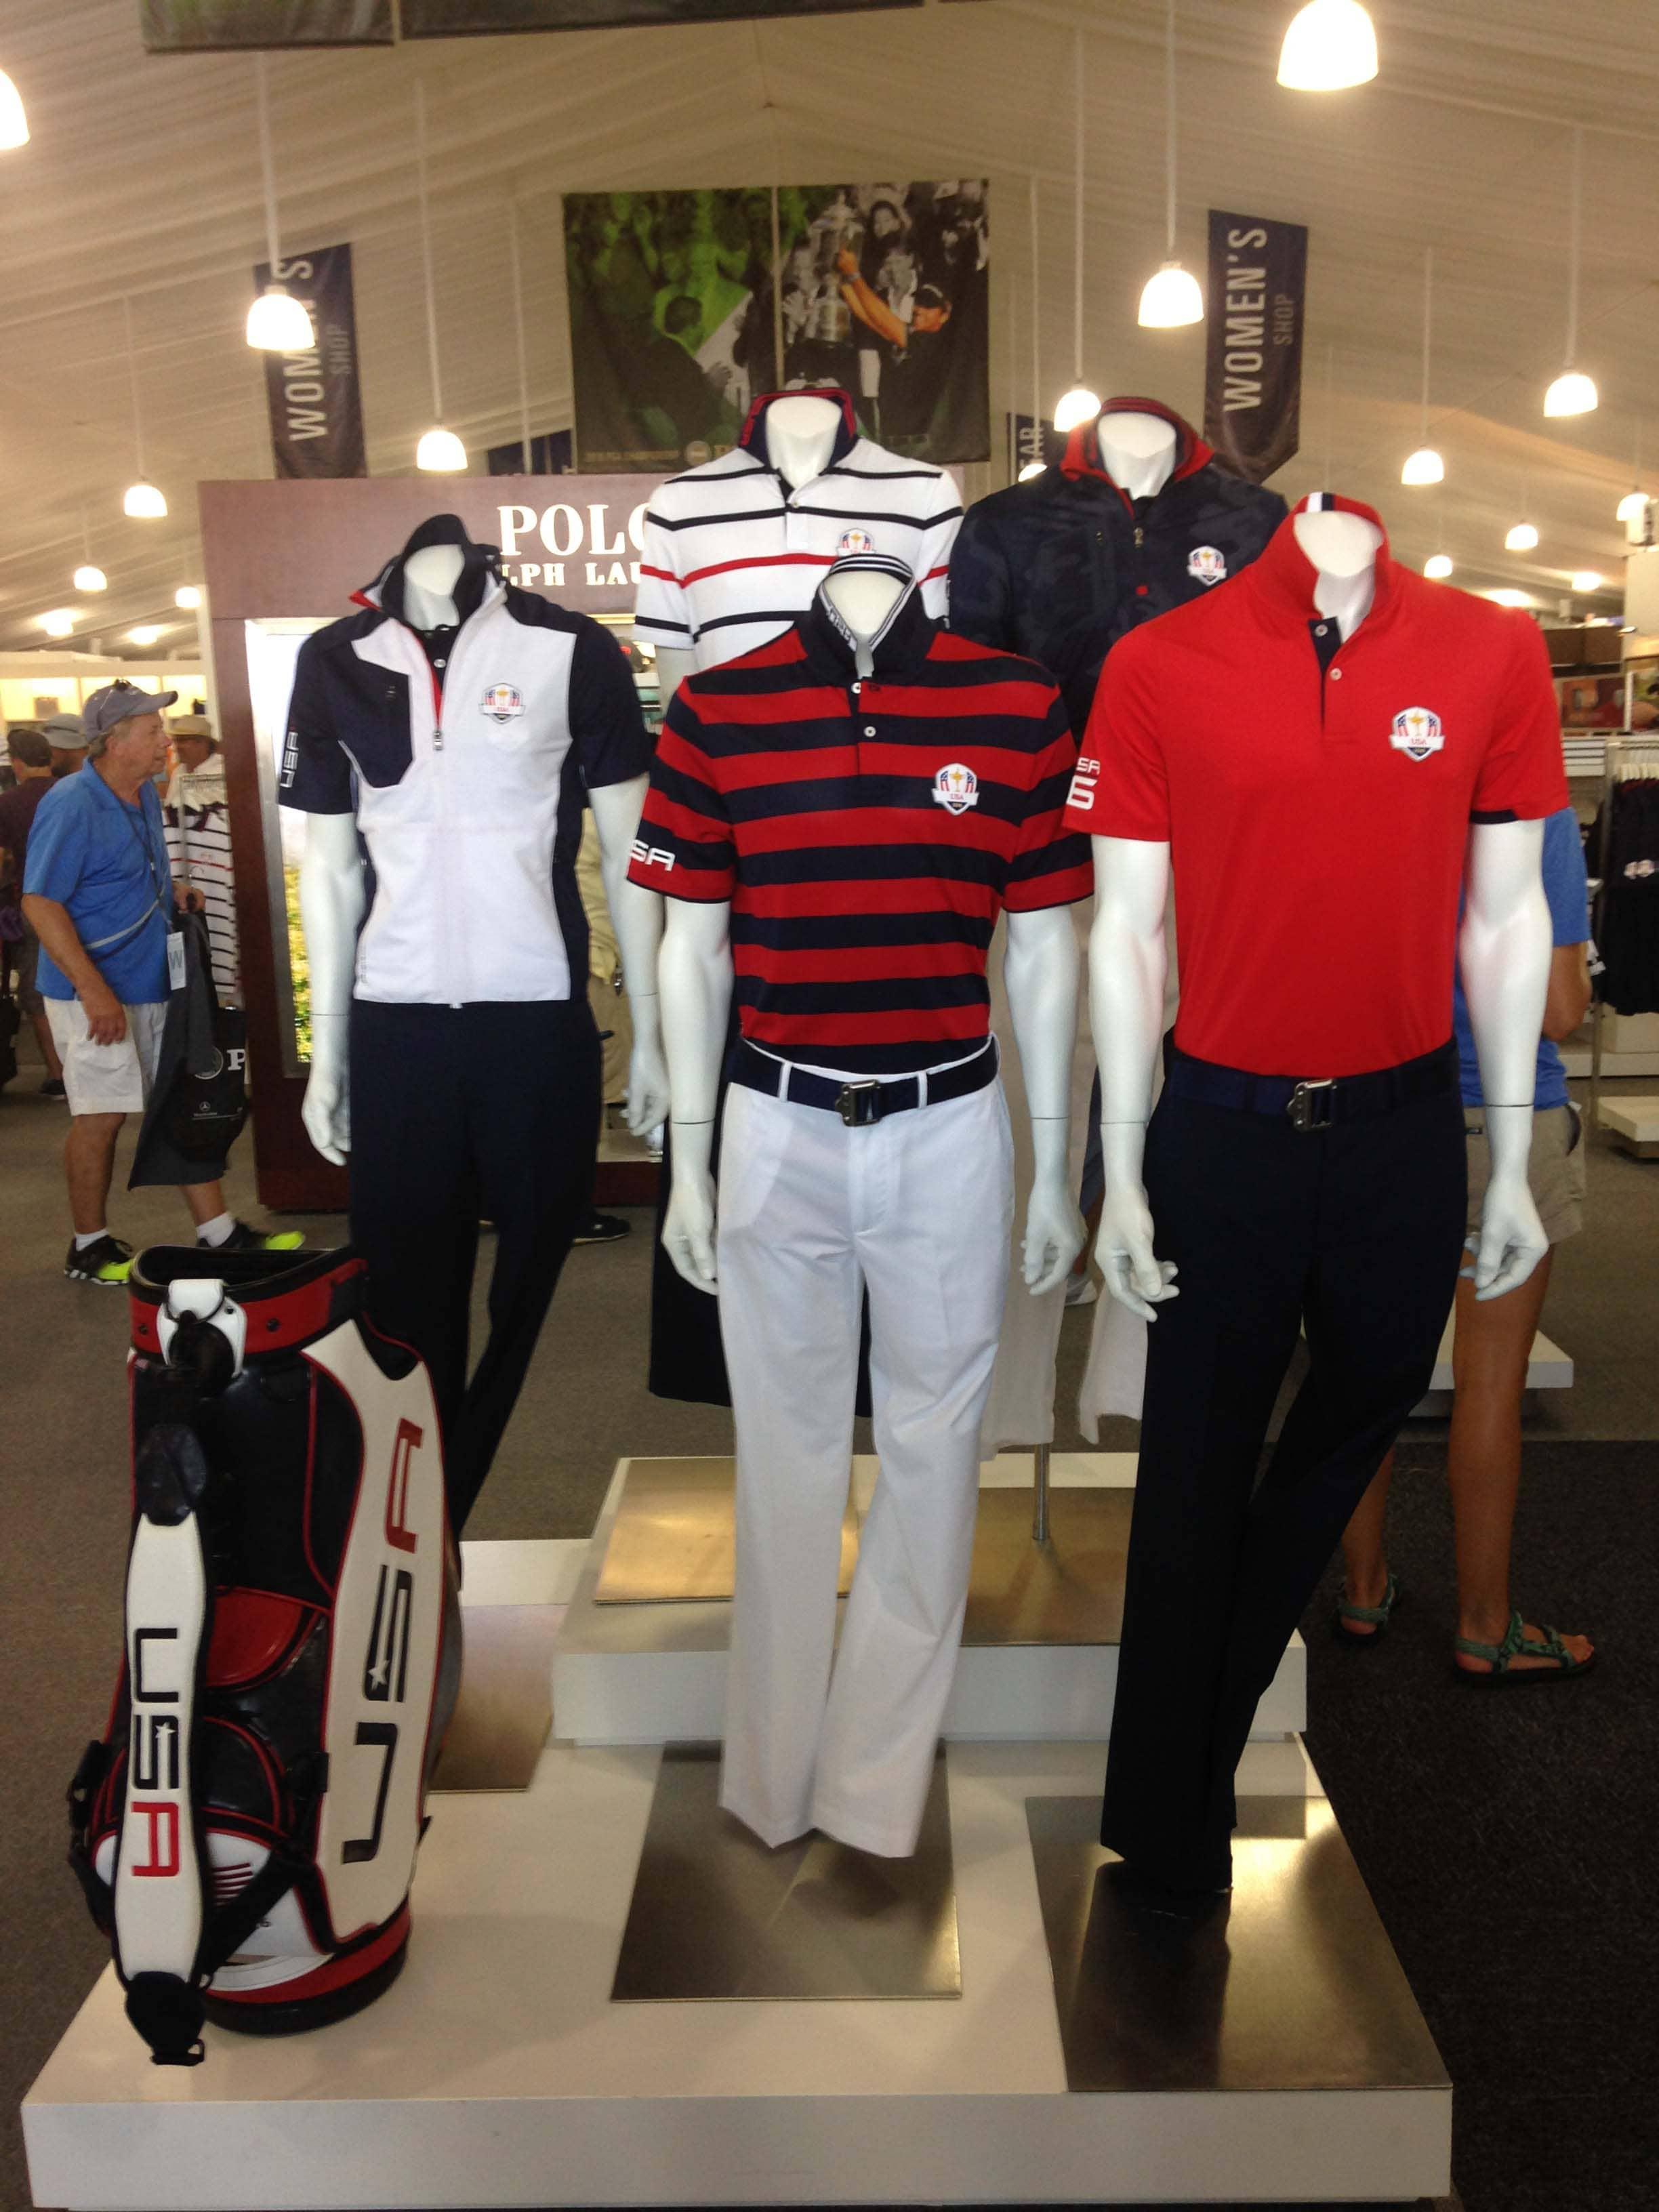 Team USA Ryder Cup uniforms